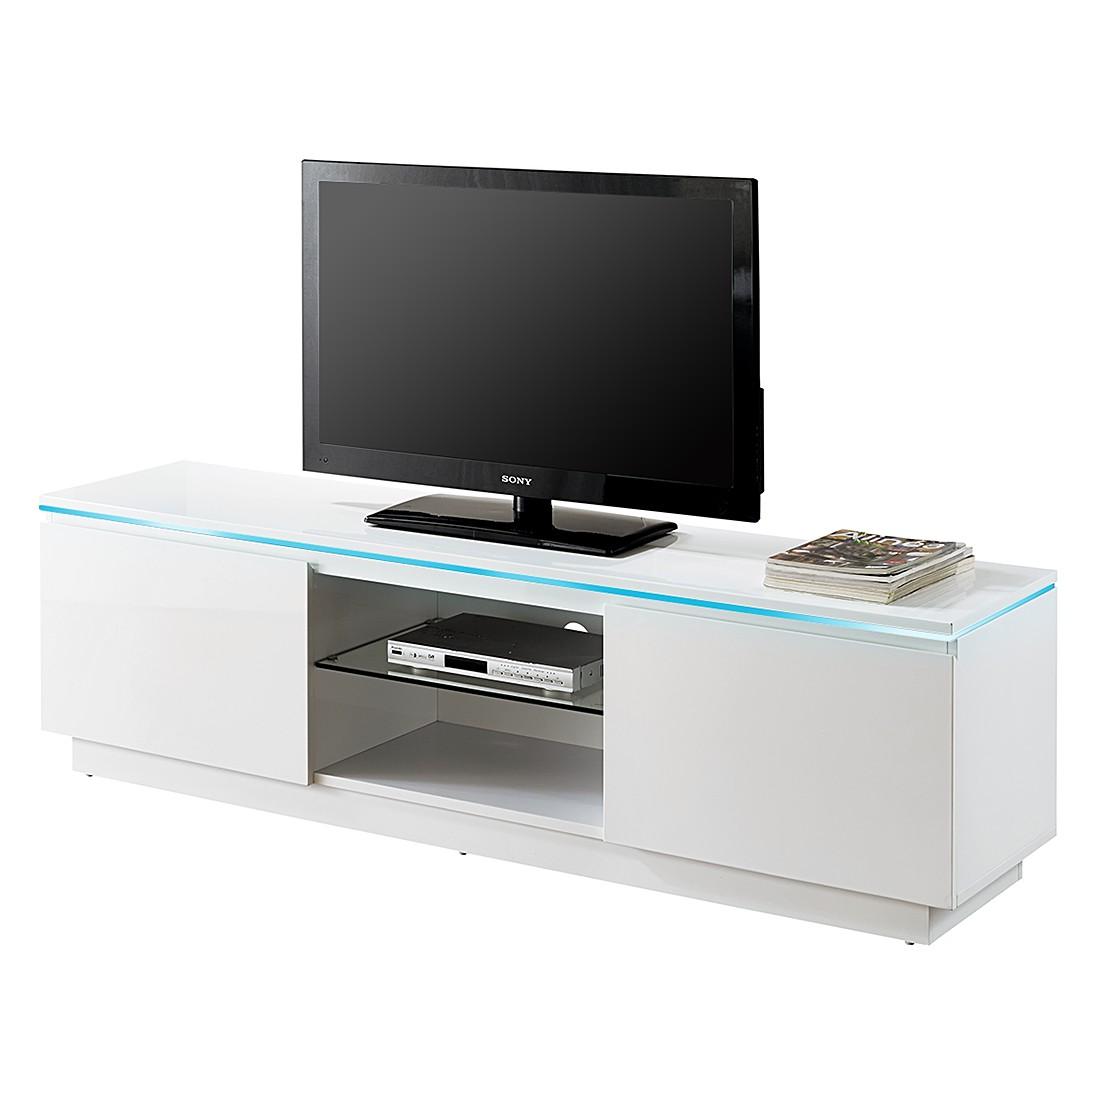 EEK A+, Meuble TV bas Annabella (éclairage fourni) - Blanc brillant, roomscape